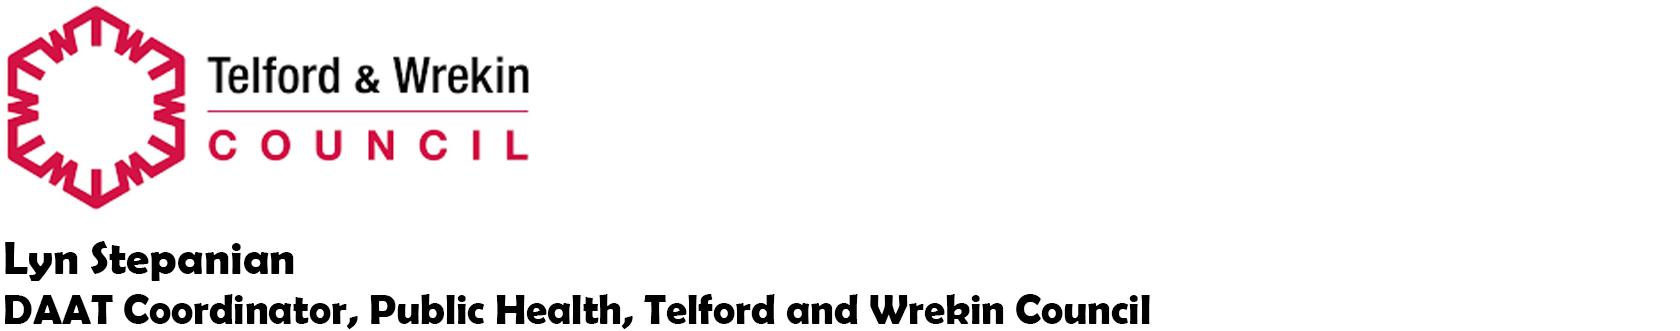 Lyn Stepanian - DAAT Coordinator, Public Health, Telford and Wreking Council